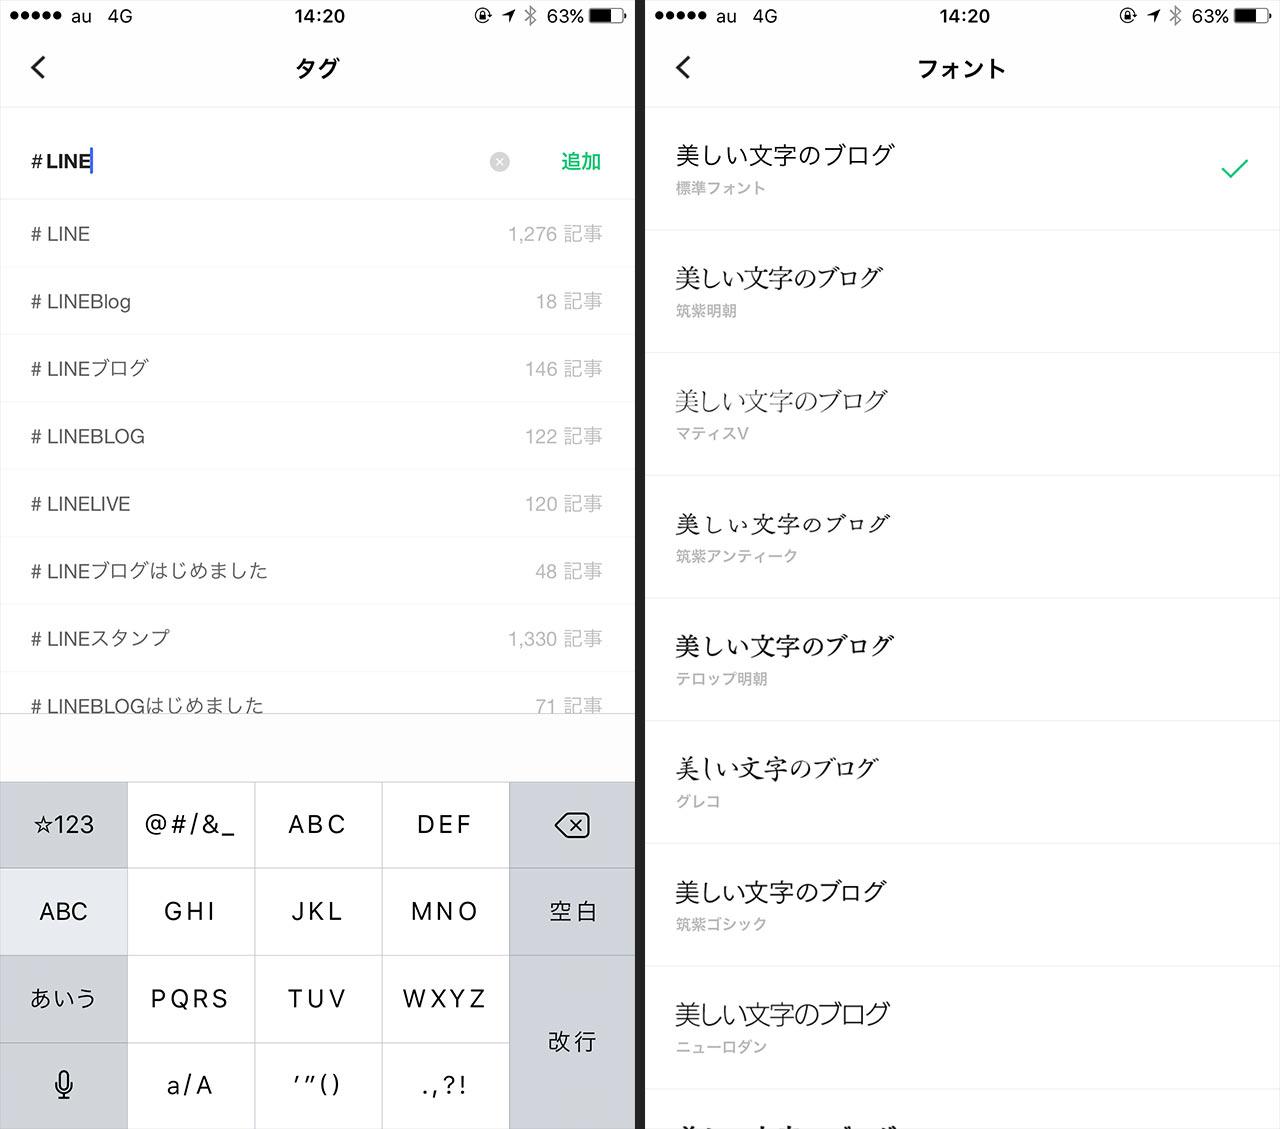 line-blog-05